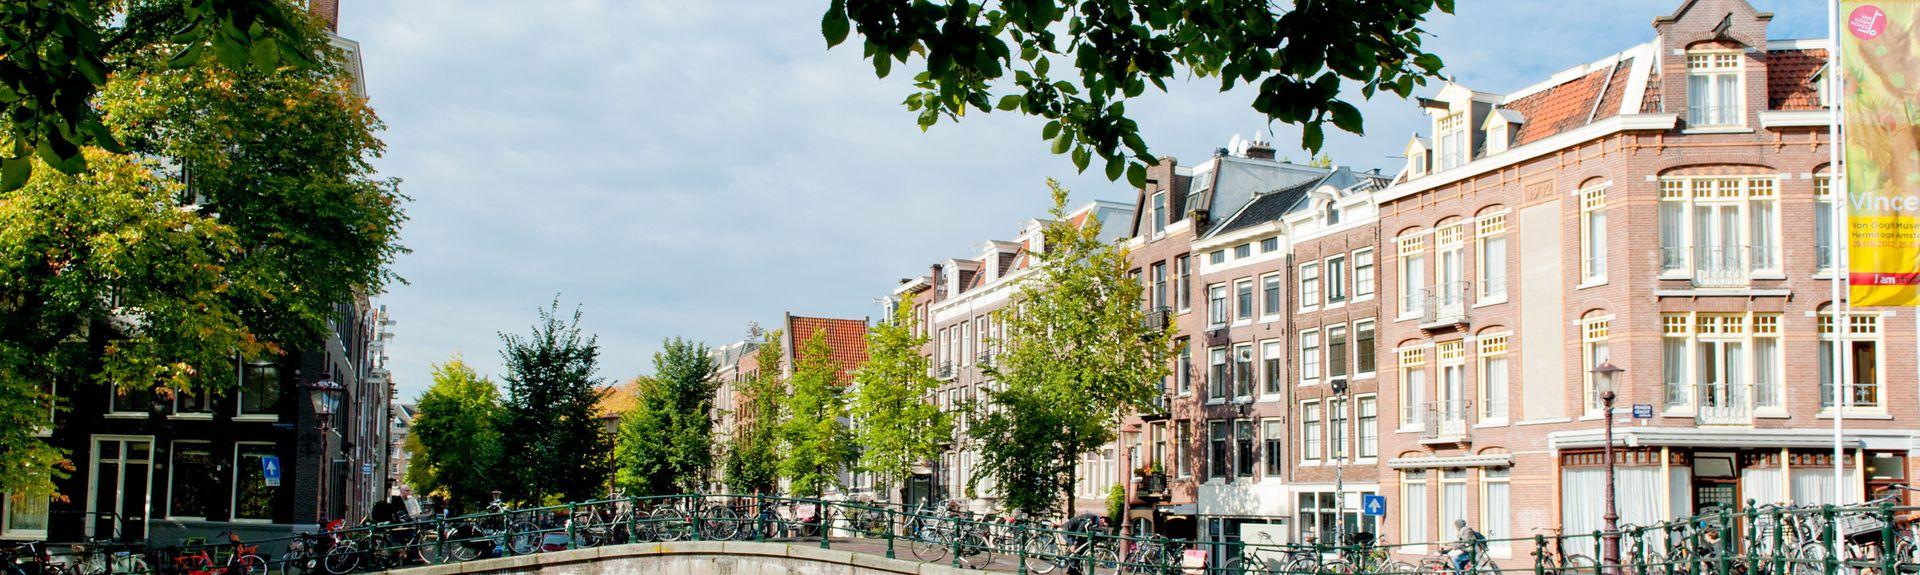 Westerpark, Amsterdam, Netherlands